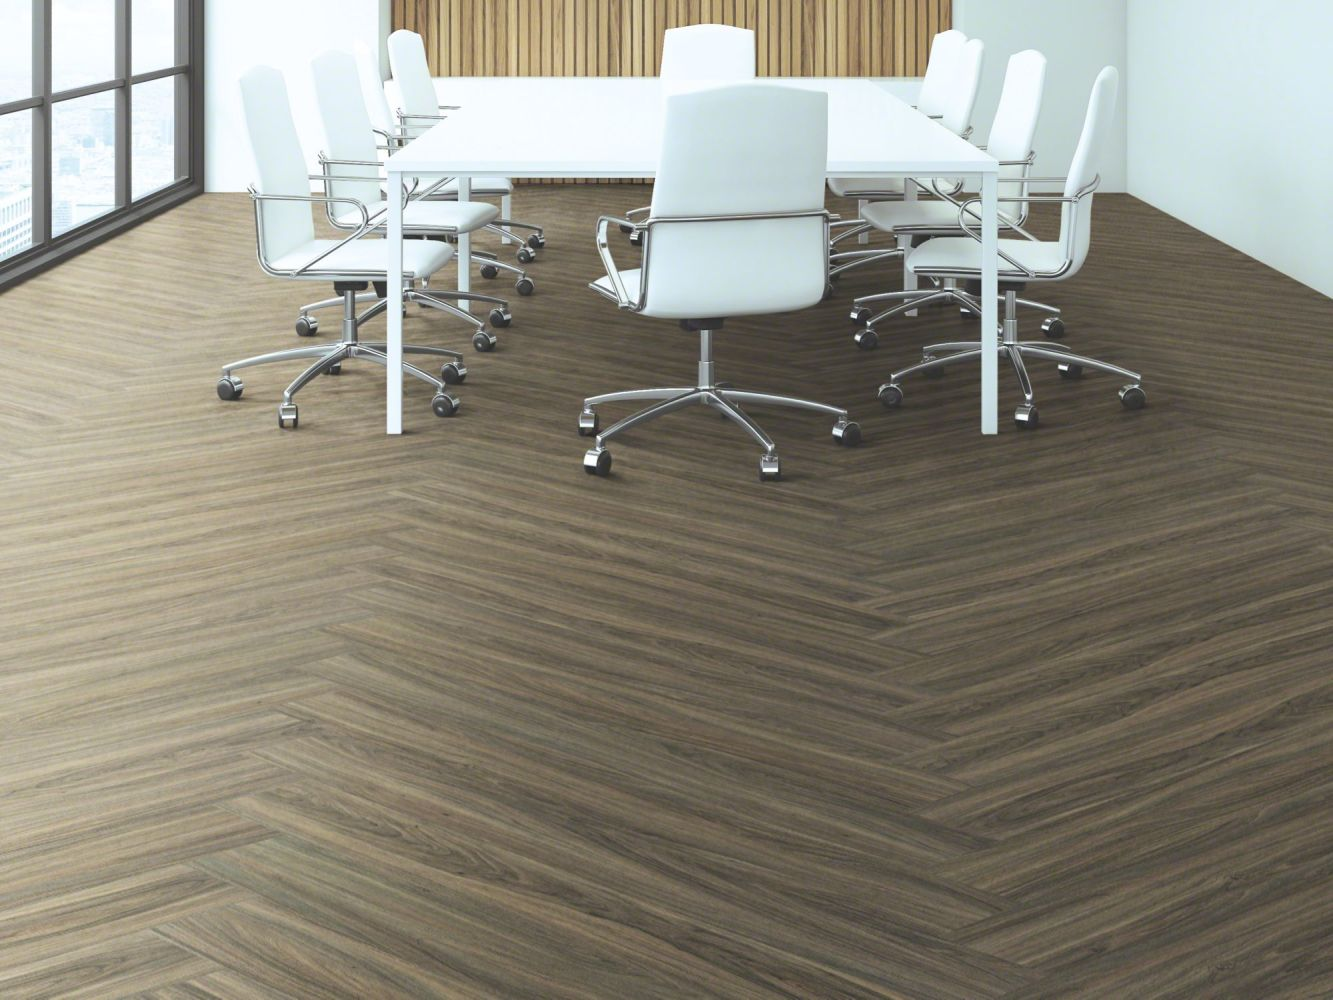 Shaw Floors Dr Horton Ballantyne Plus Click Cinnamon Walnut 00150_DR036